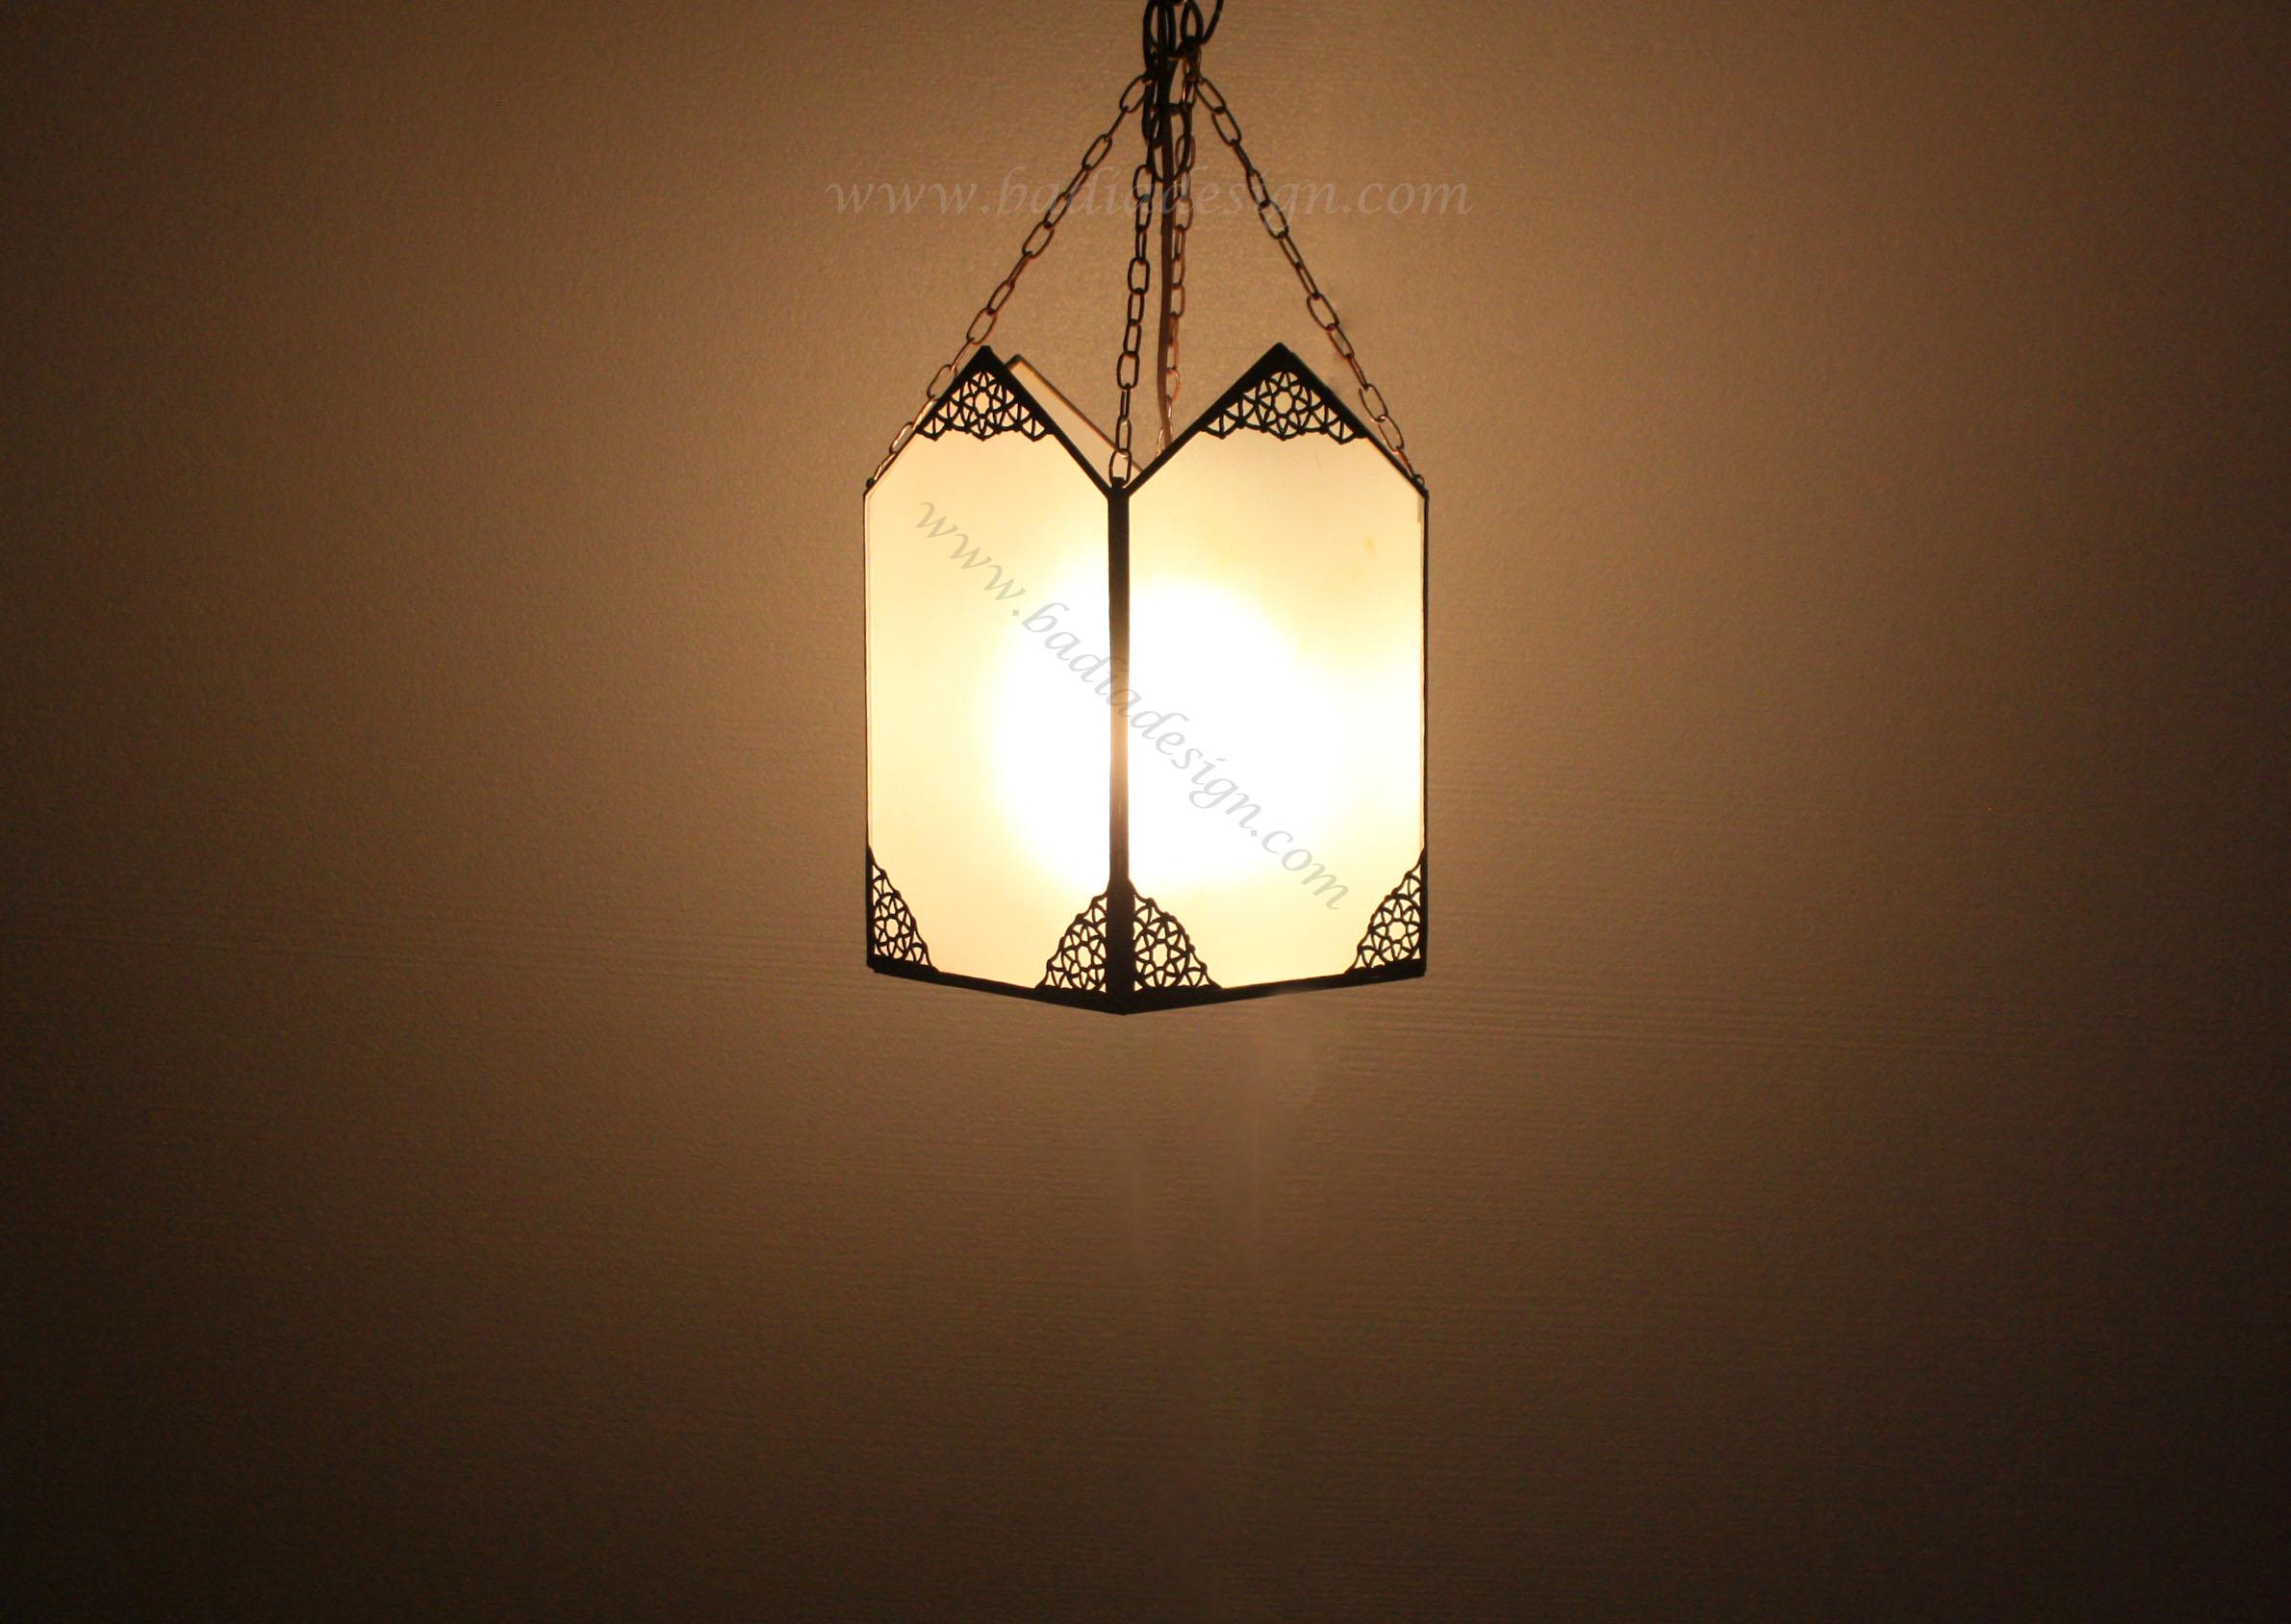 moroccan-lighting-houston.jpg